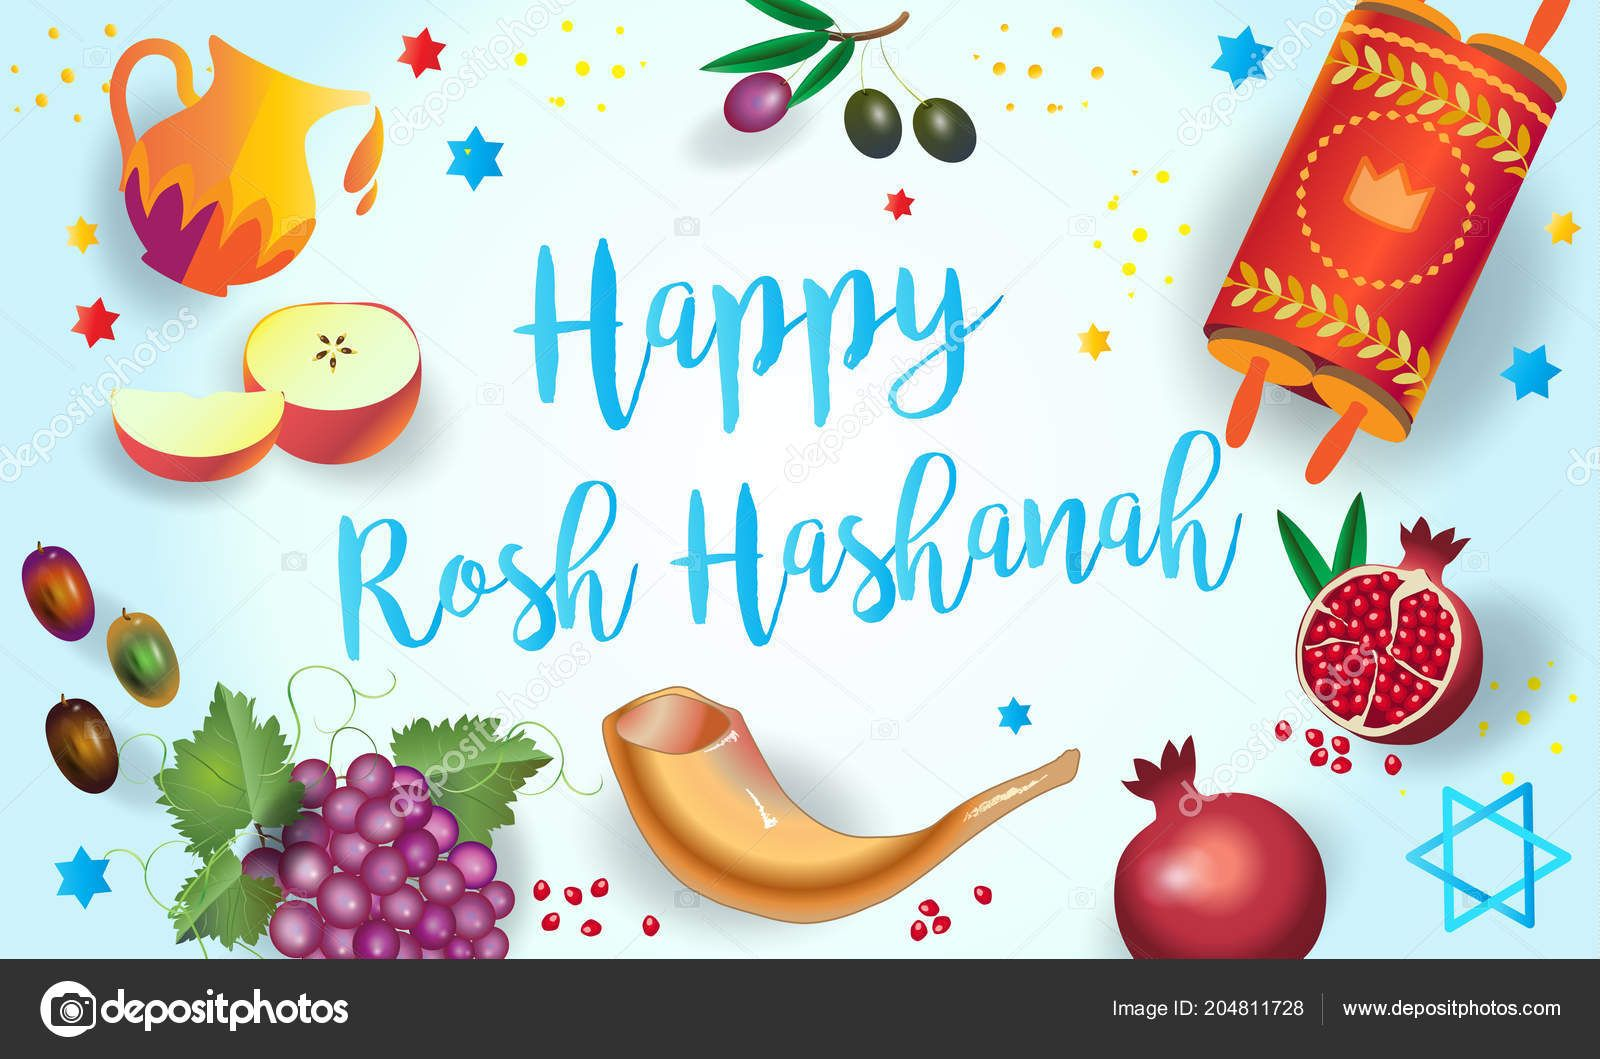 Download Happy Rosh Hashanah Greeting Card Jewish New